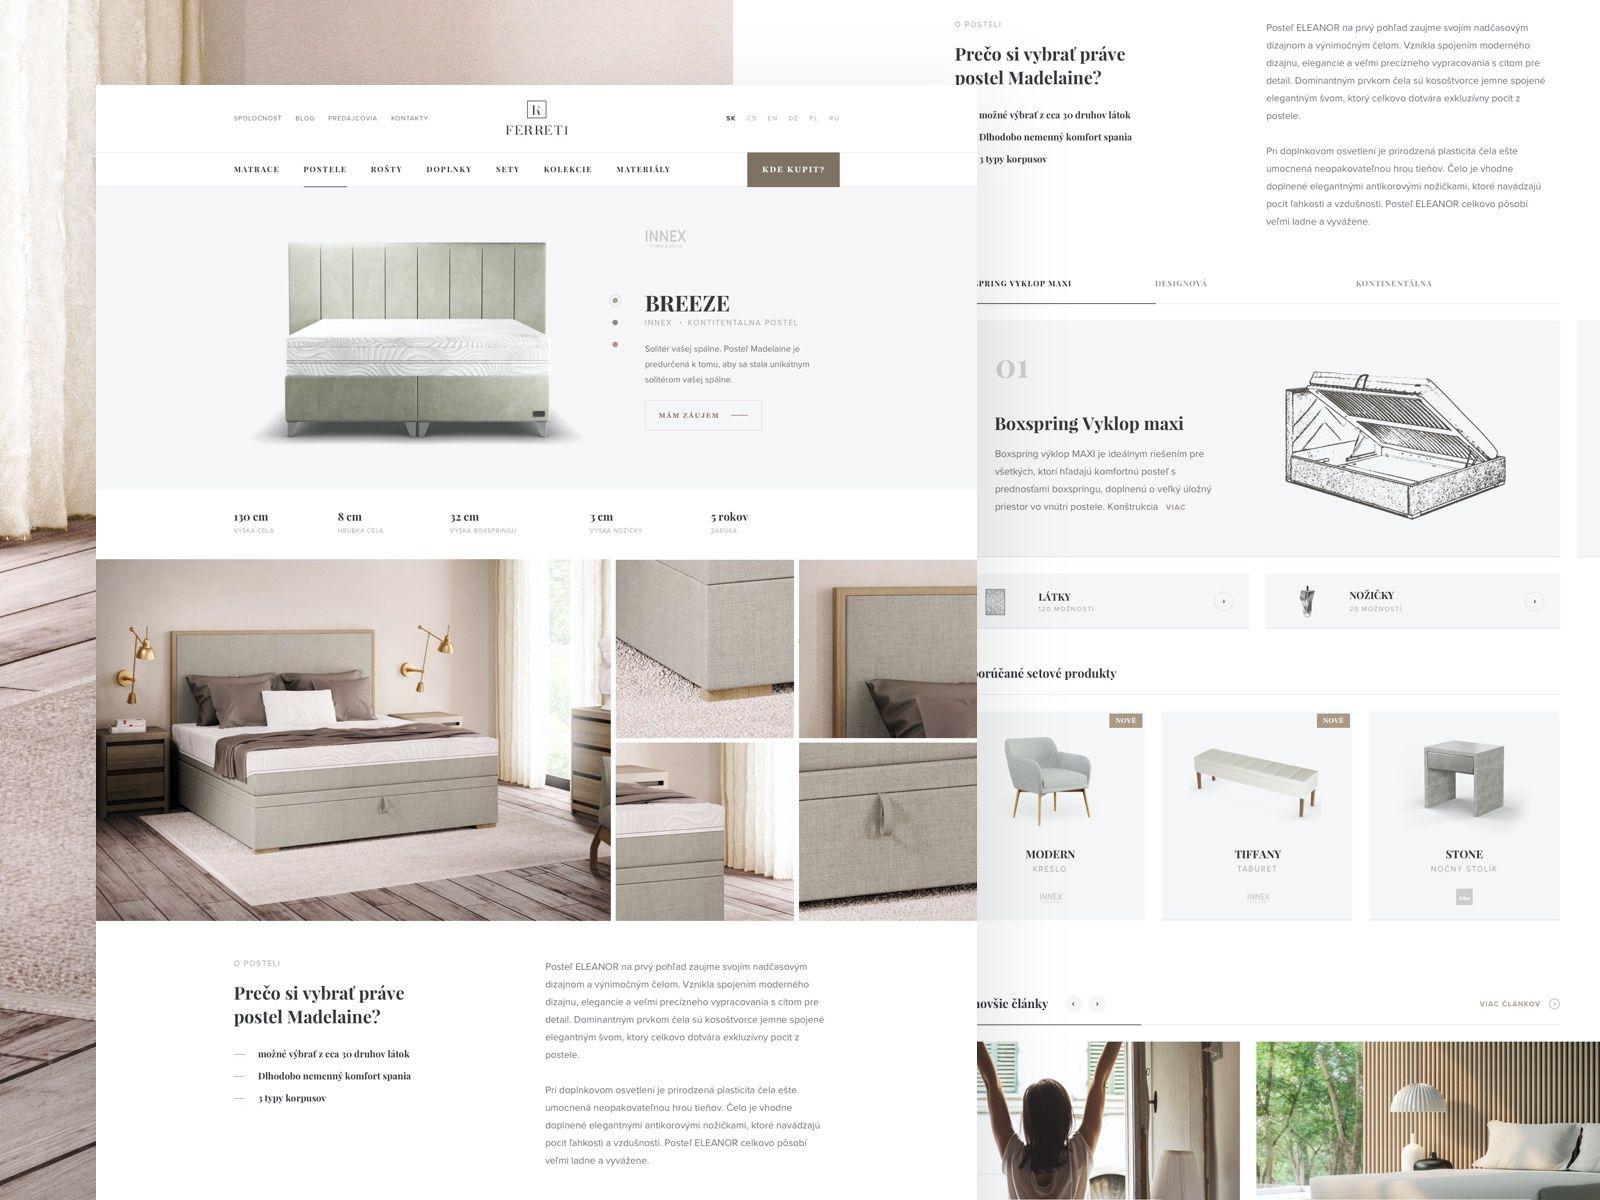 Ferreti Detail page in 2020 Design, Milan, Graphic